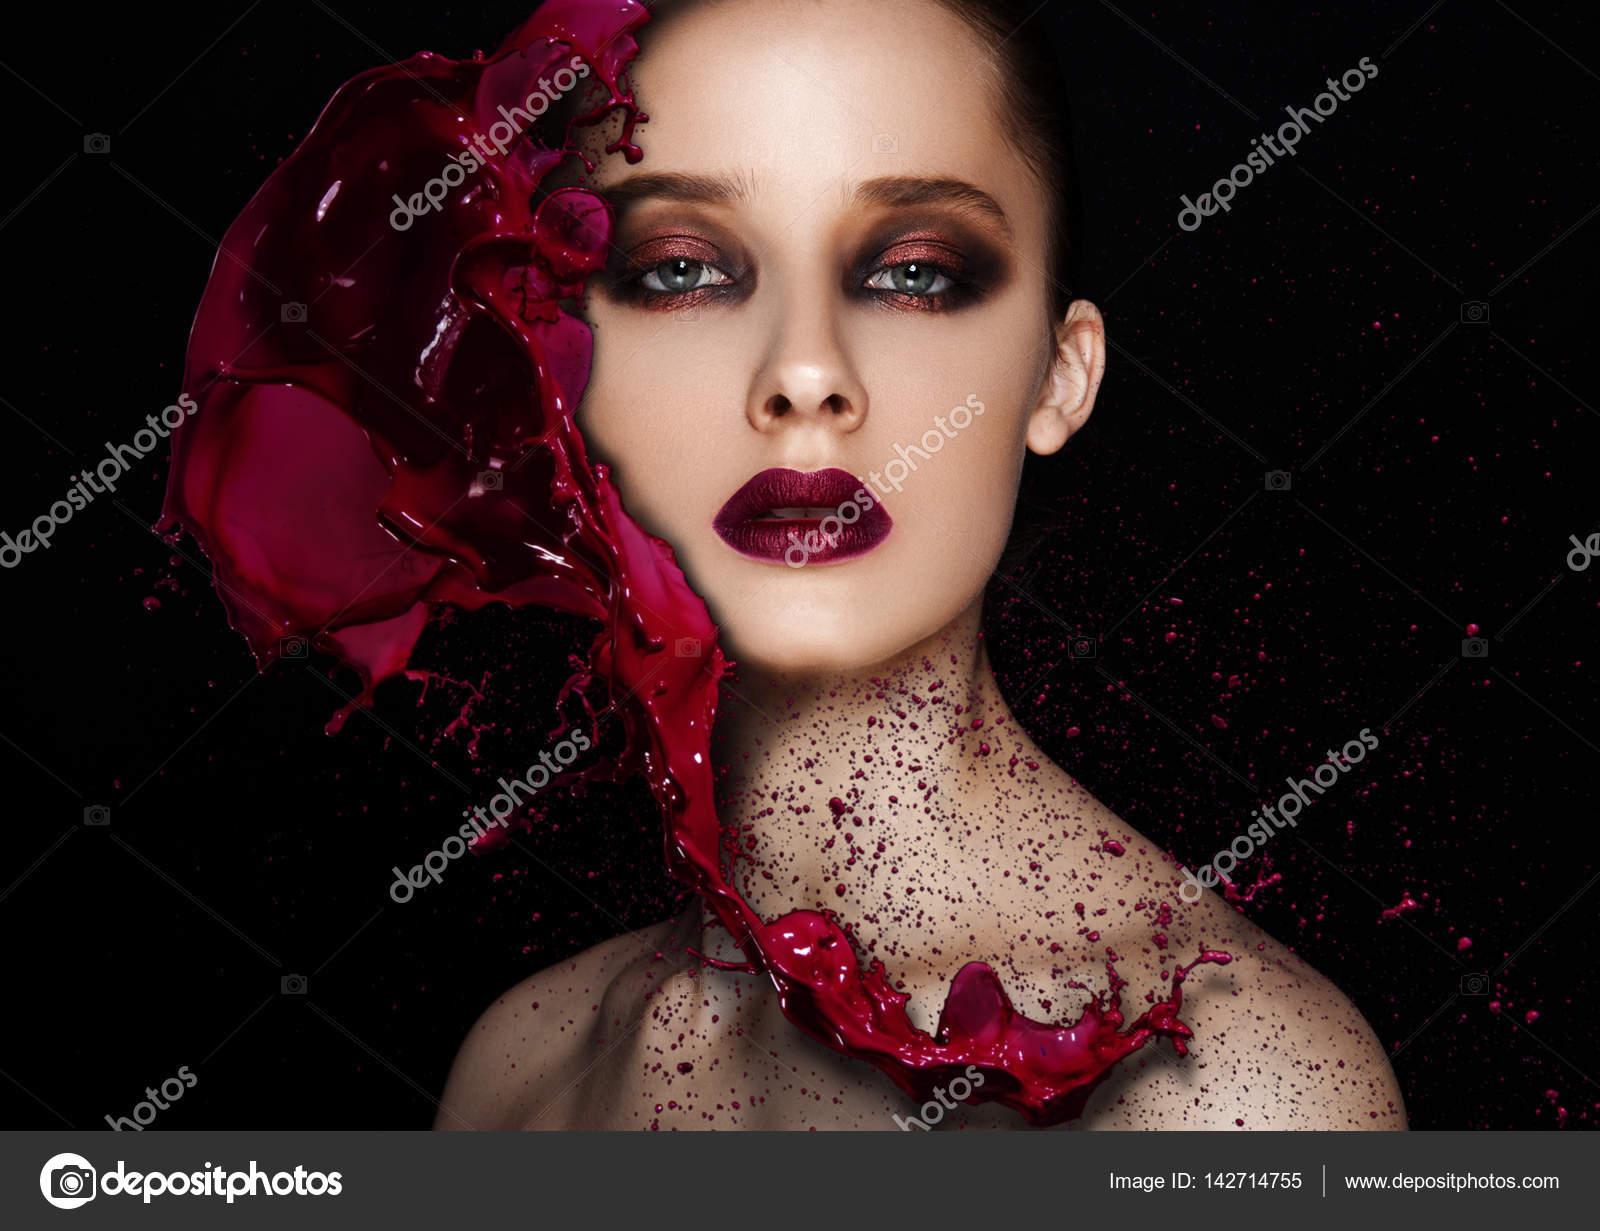 Red paint splash over beauty makeup model girl \u2014 Stock Photo